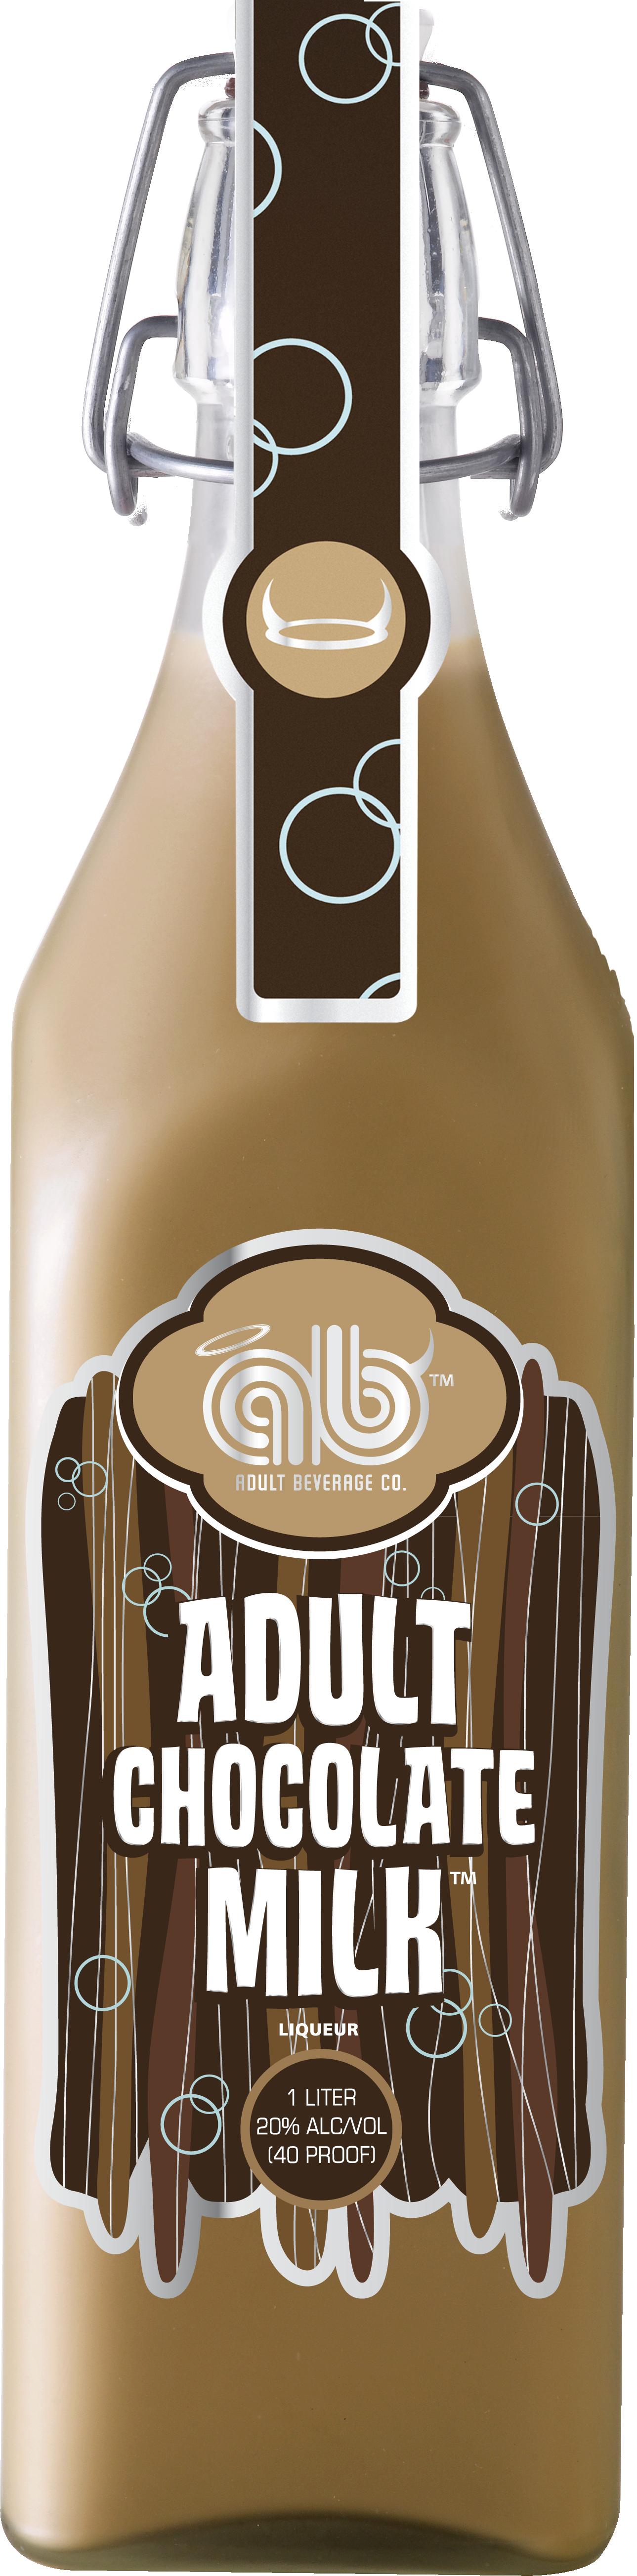 Adult Chocolate Milk - Adult Beverage Company | Adult Chocolate ...